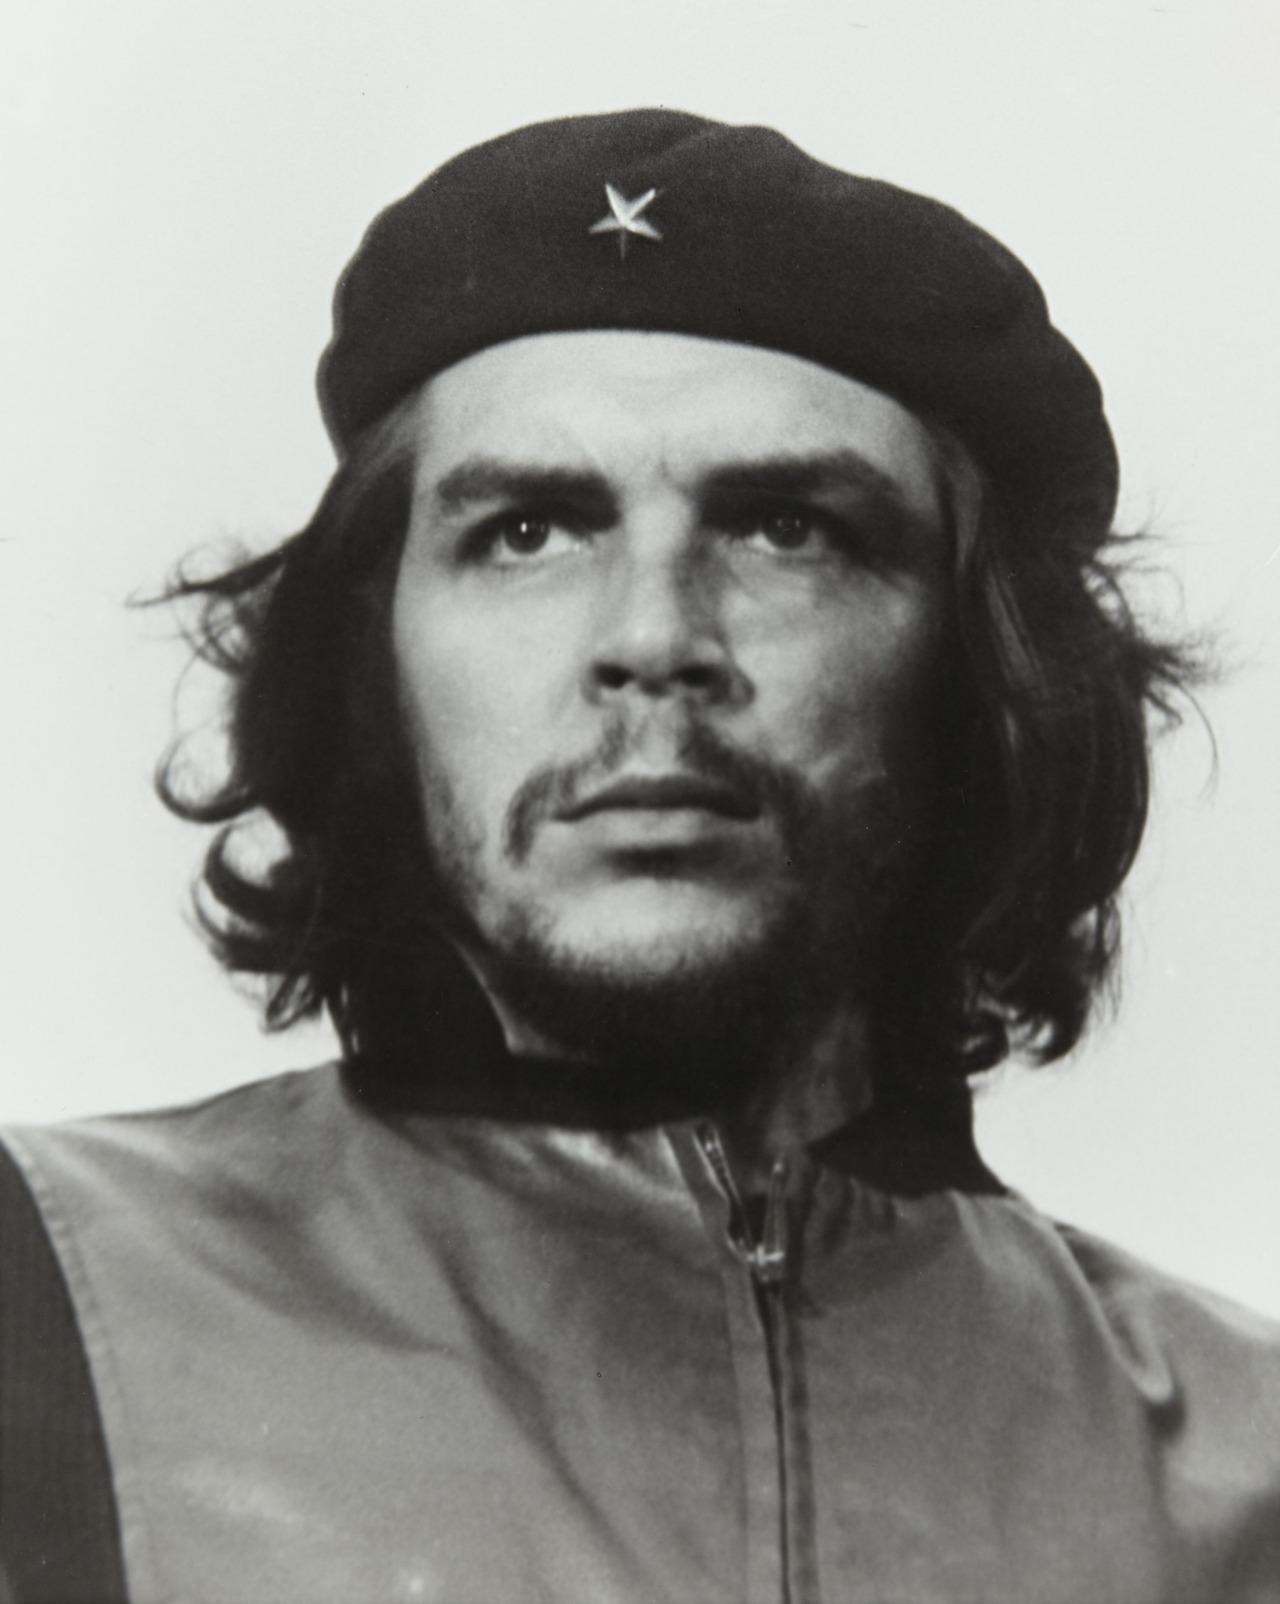 Che Guevara Alberto Corda Cropping iconic photograph